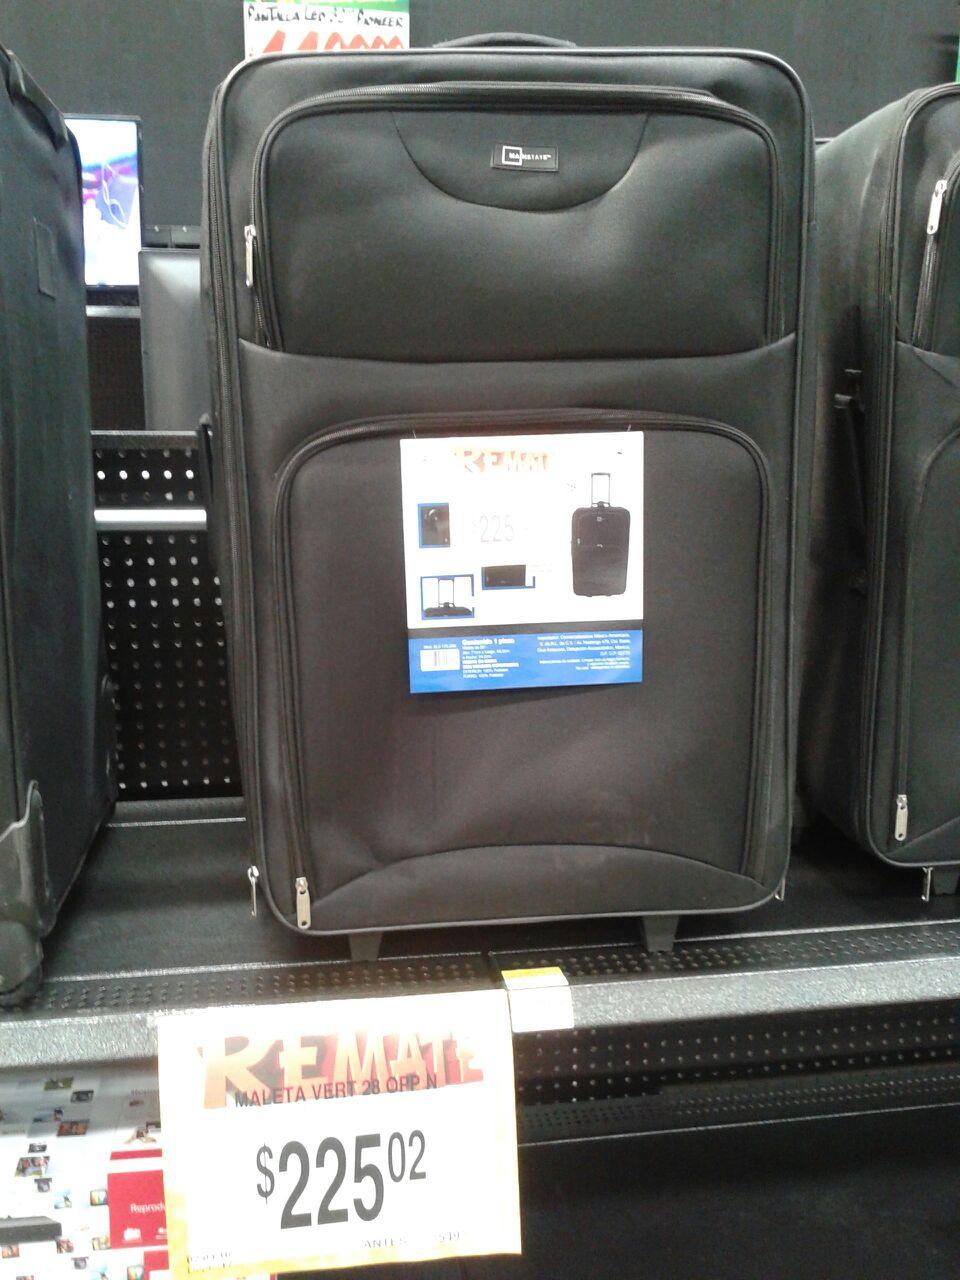 "Bodega Aurrerá: maleta de viaje con ruedas 28"" a $225.02 y mas"